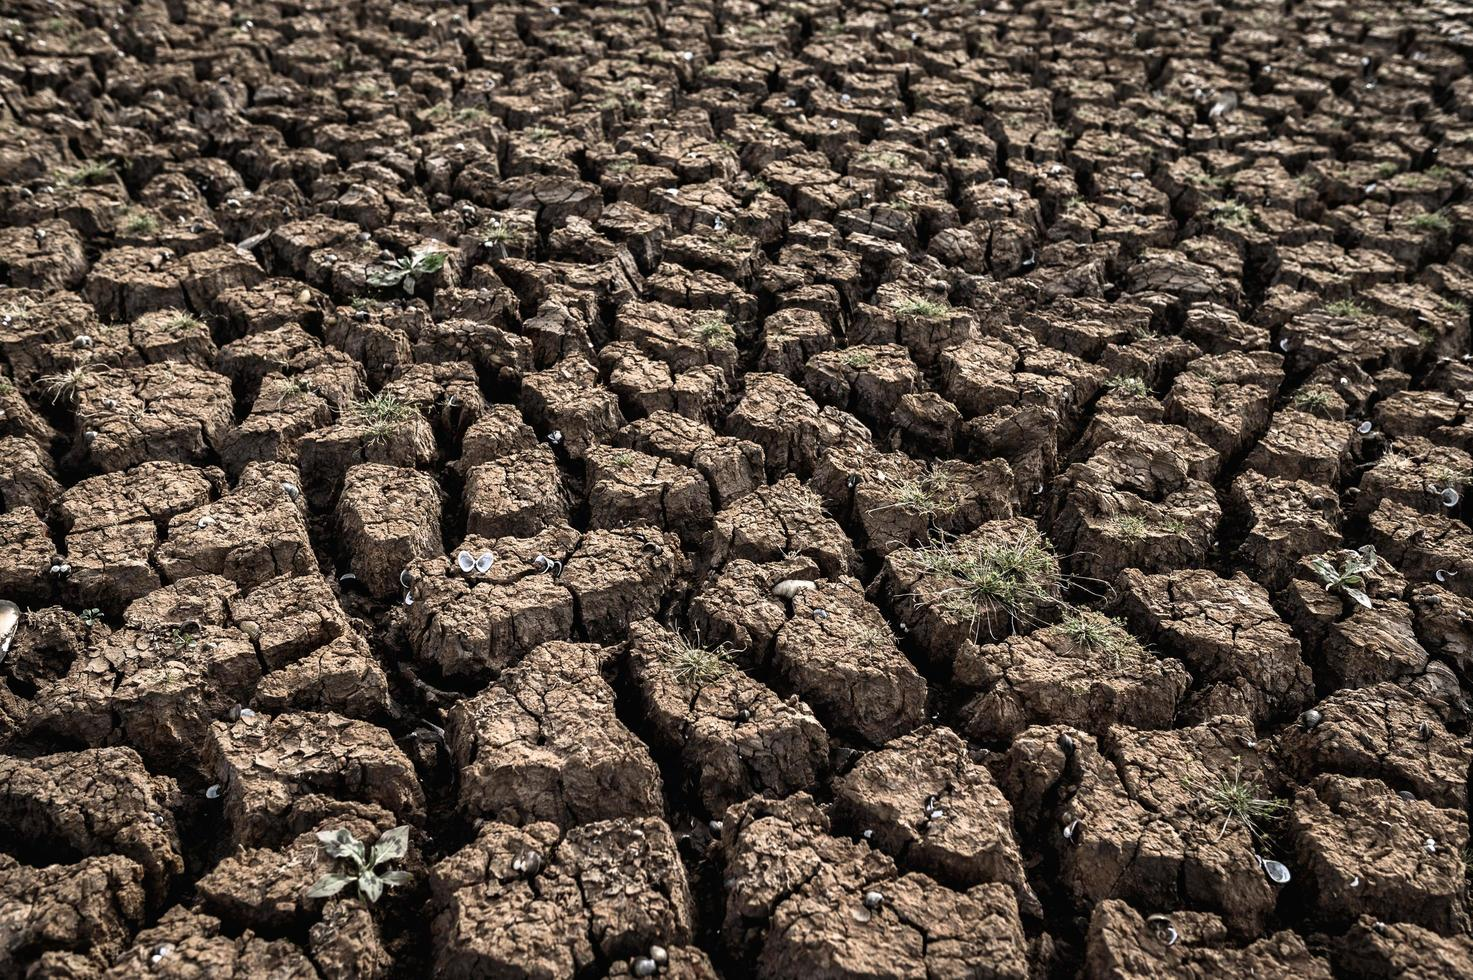 terre aride au sol sec et craquelé photo